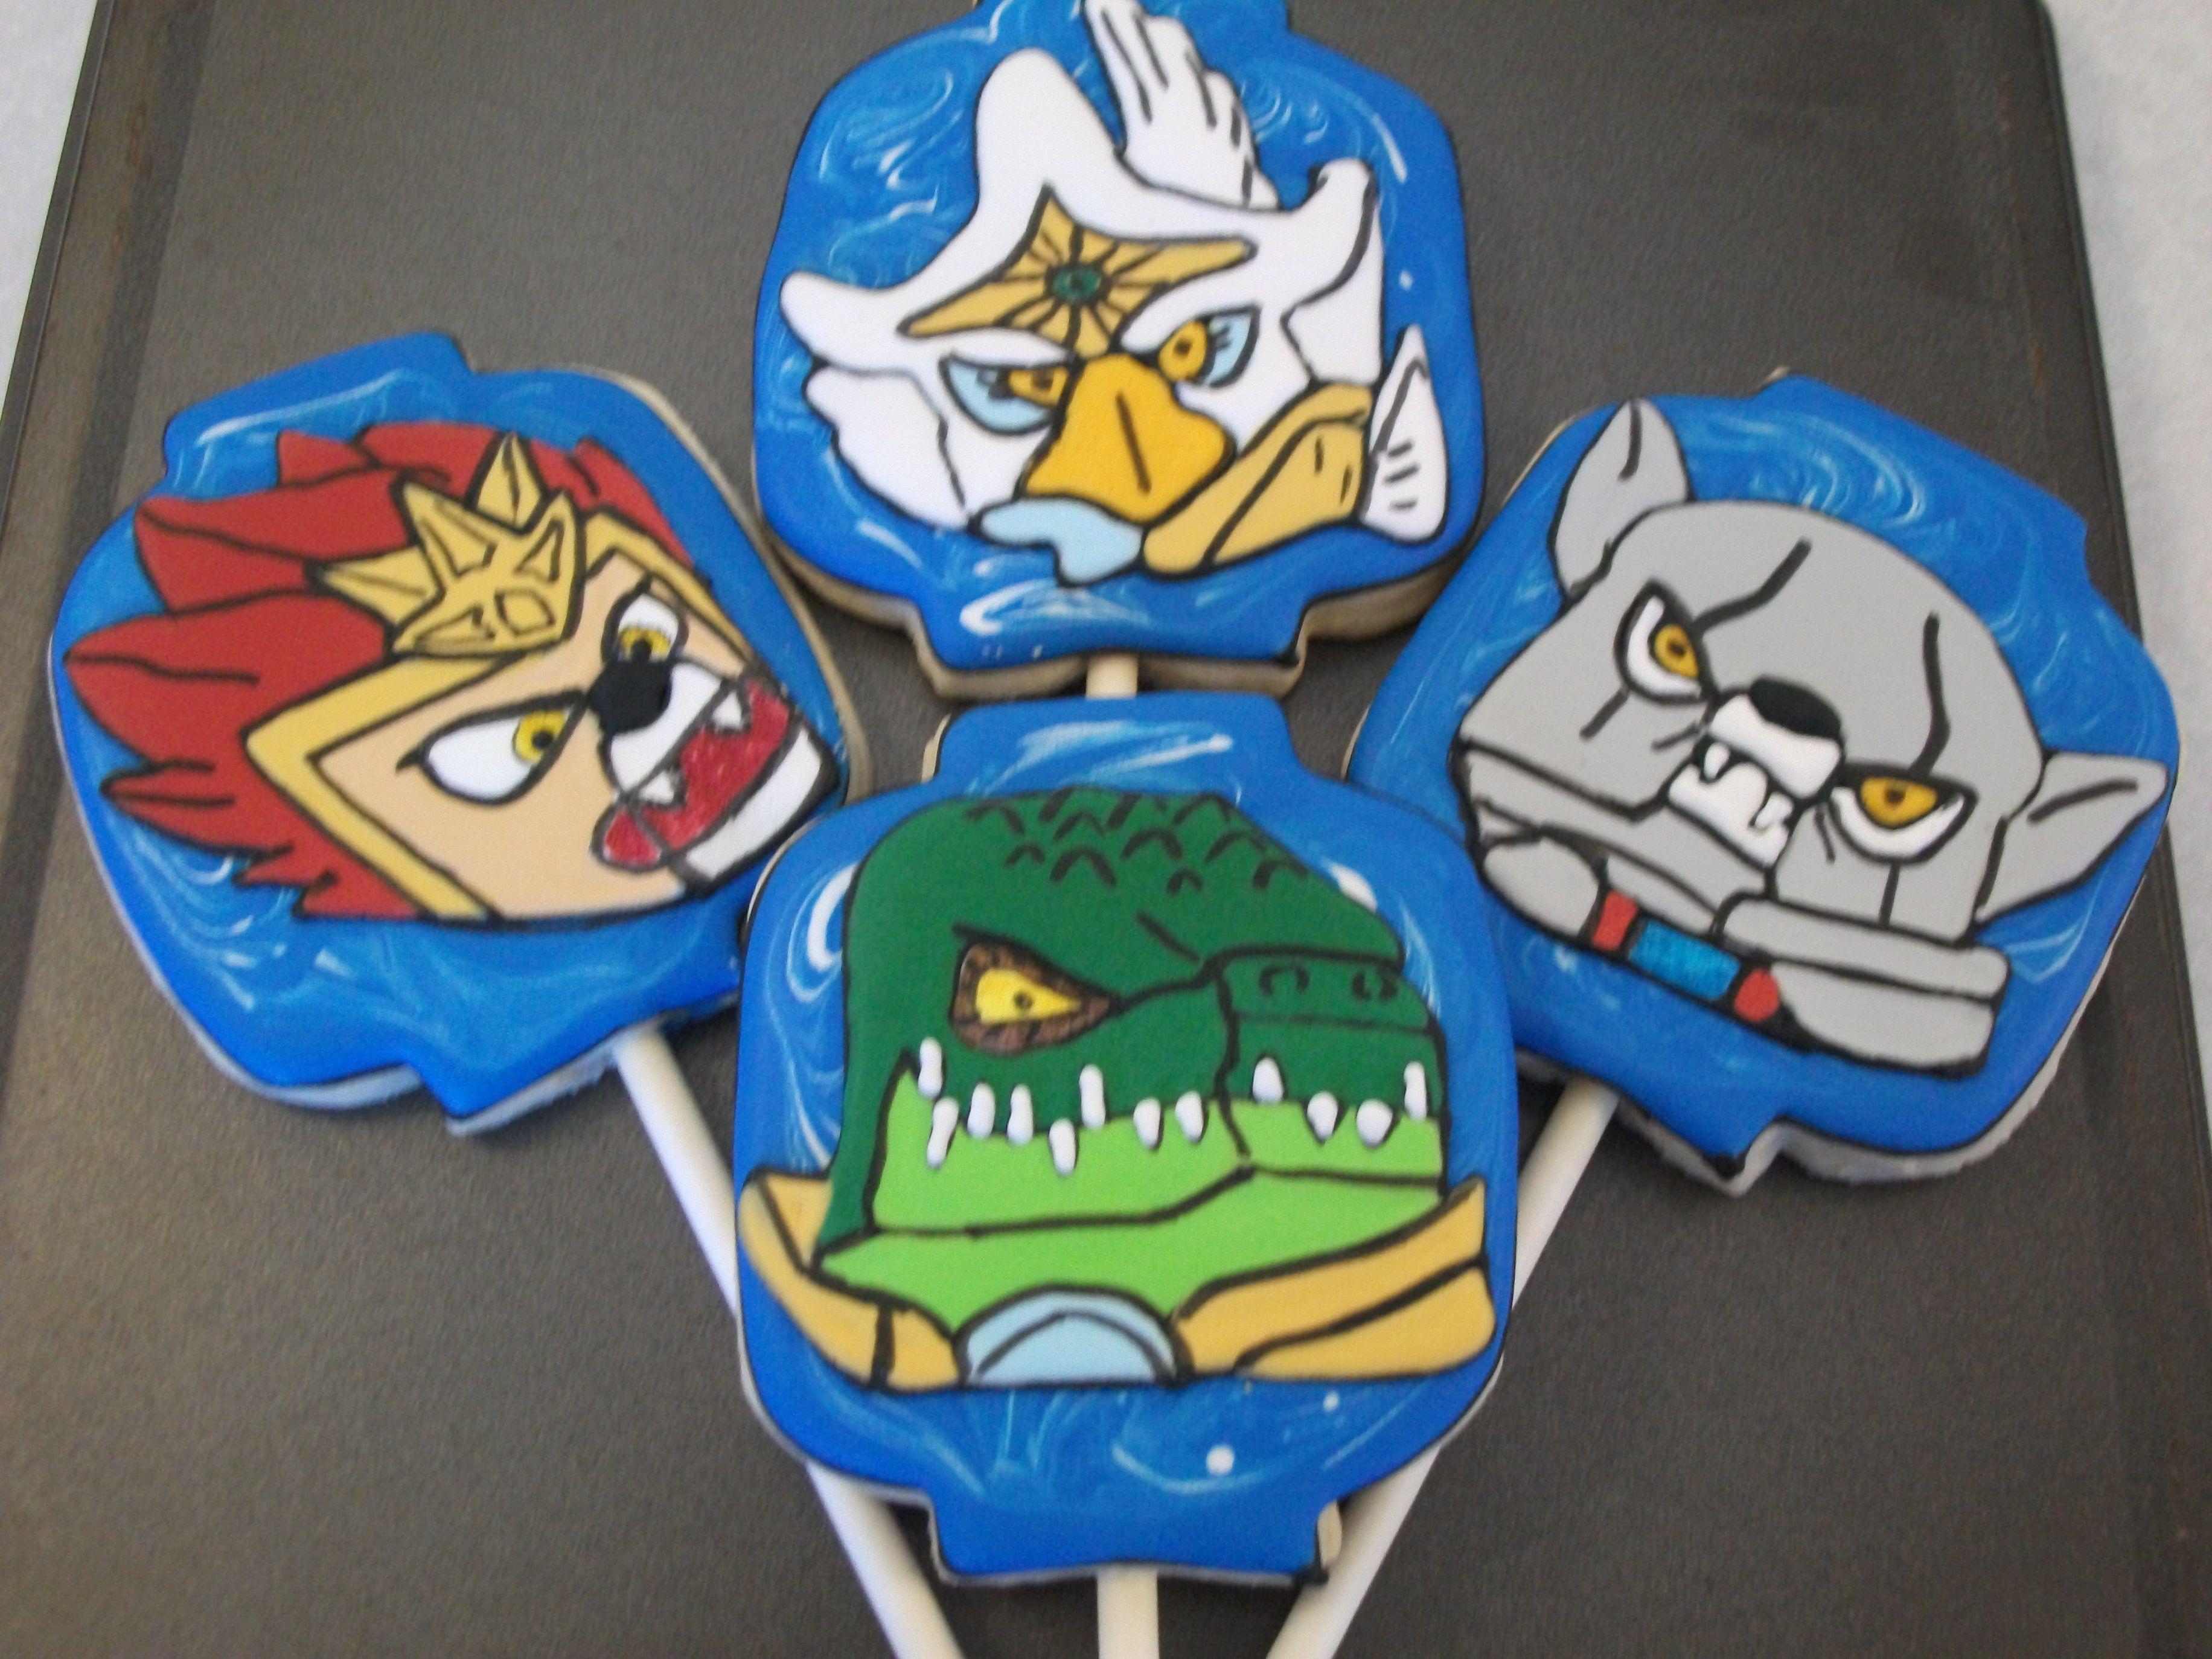 chima lego character cookies cookie art cookies